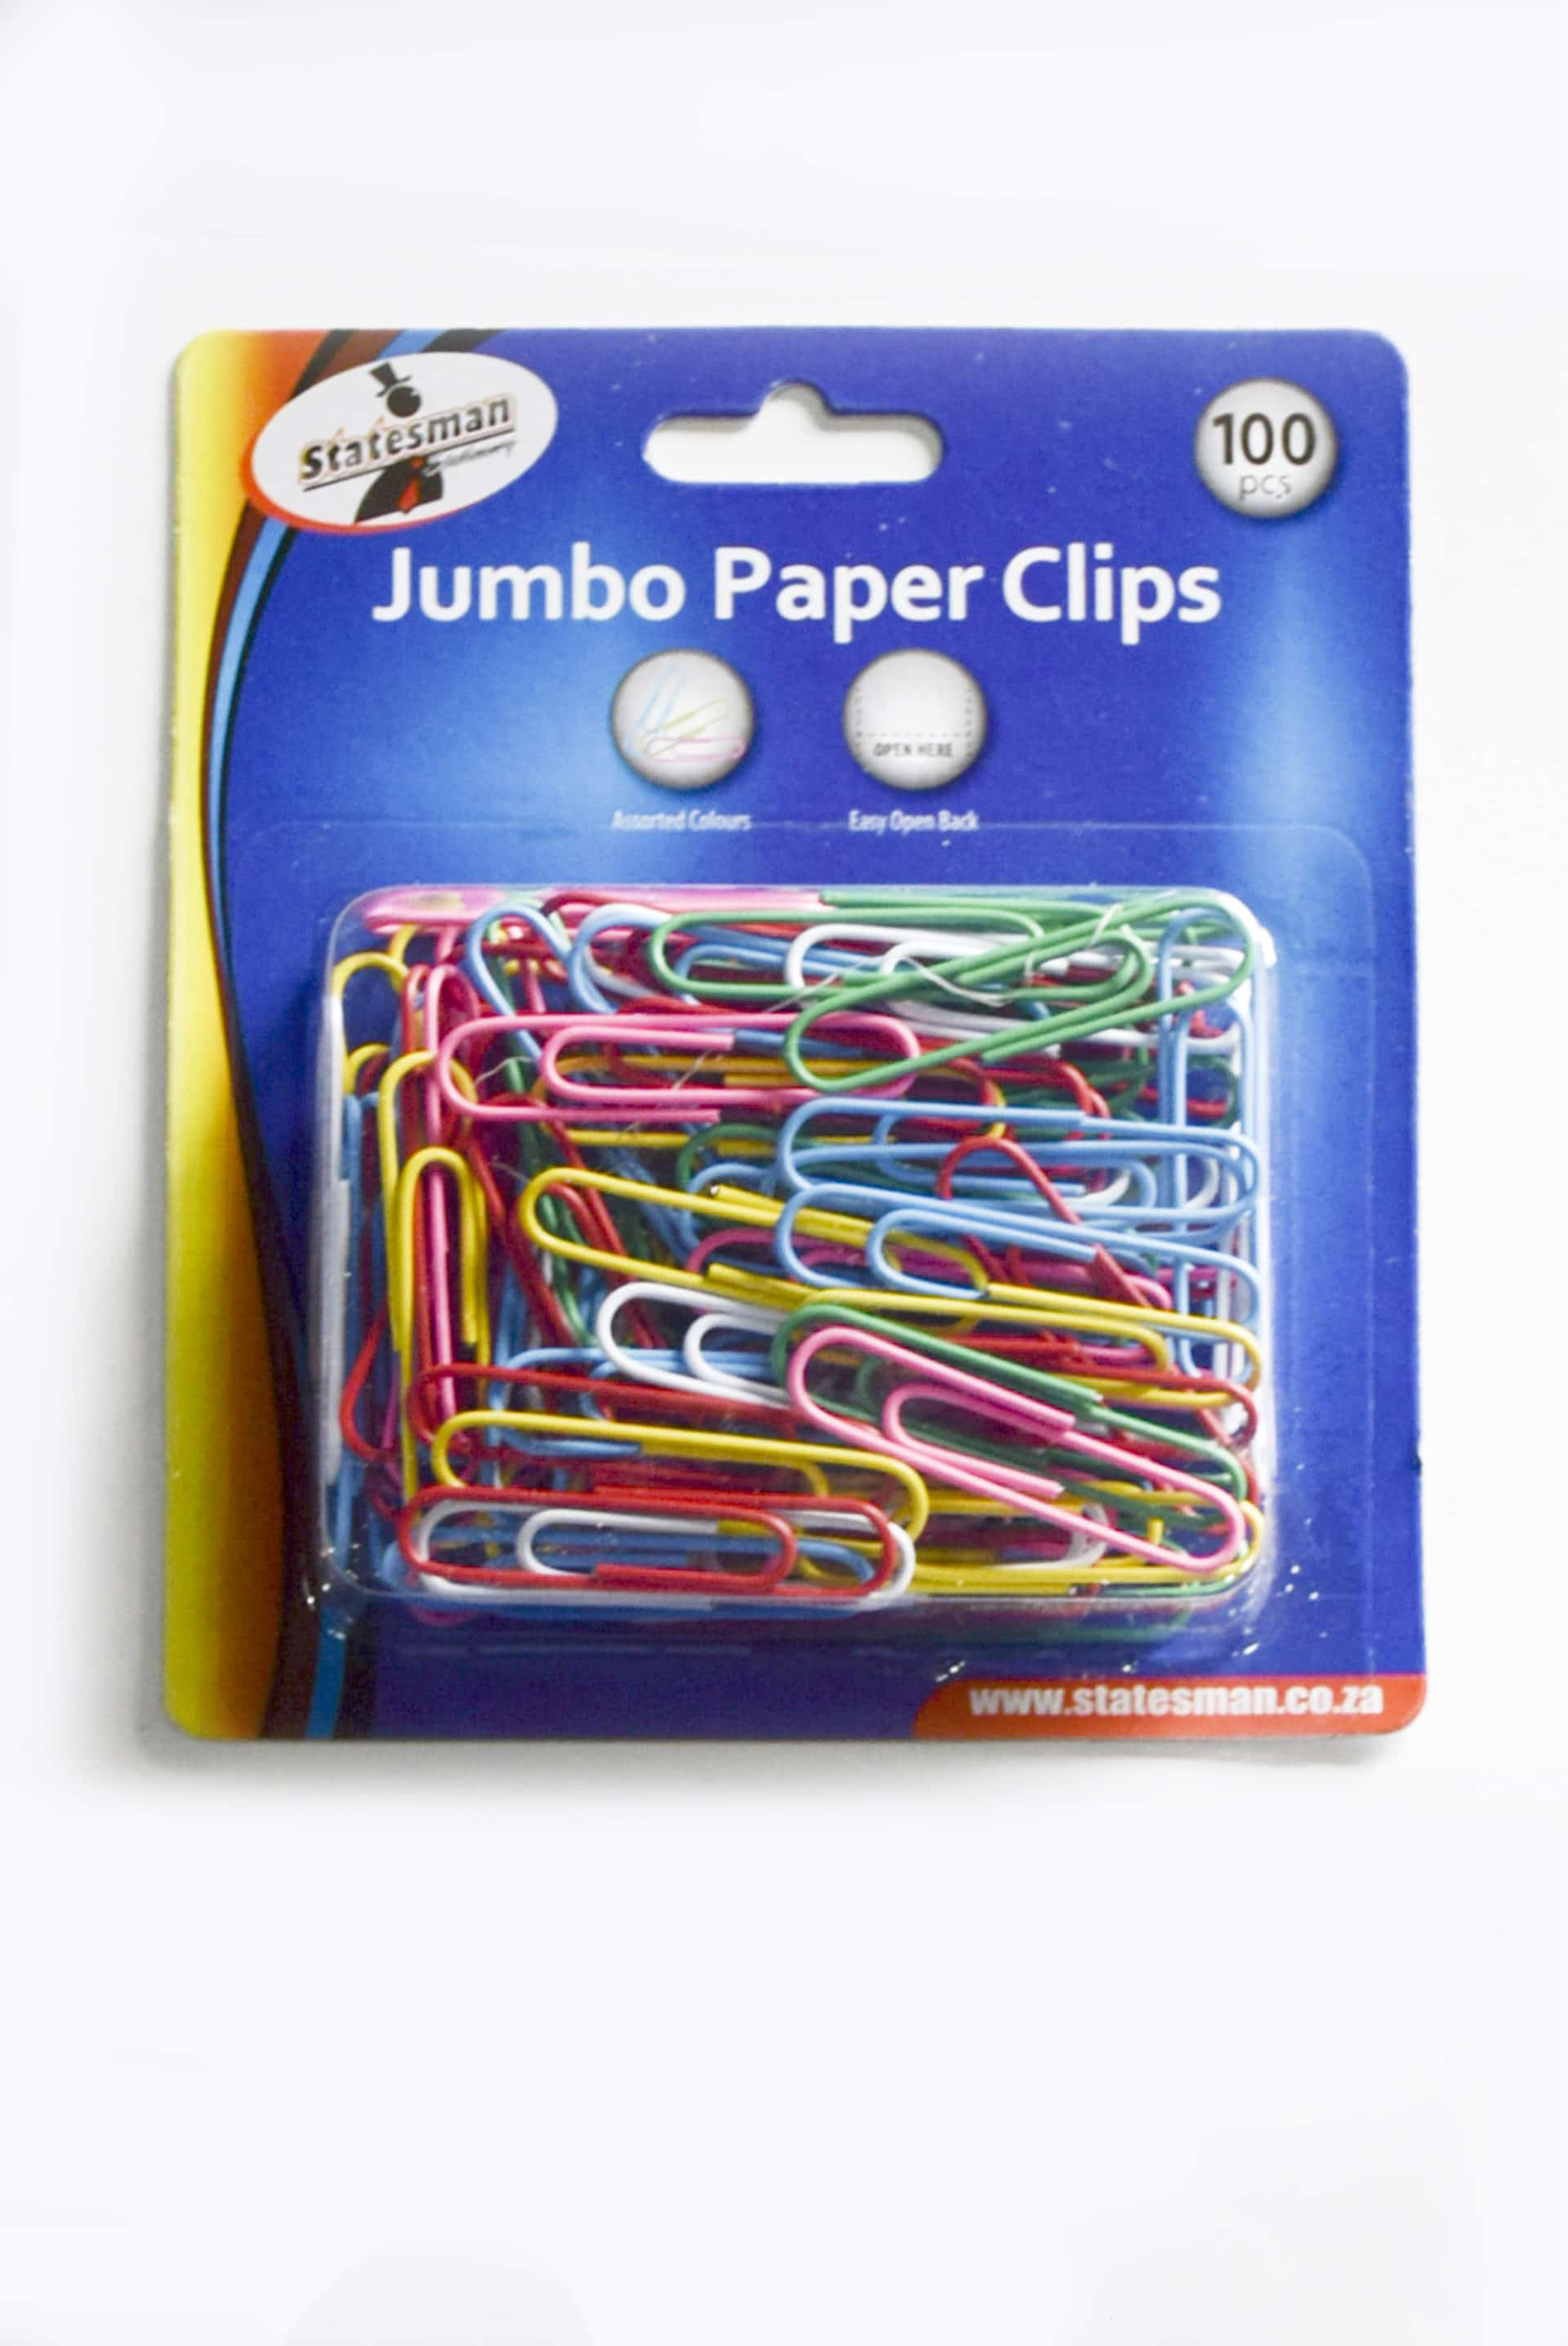 Jumbo Paper Clips 100's Plastic Coated 1